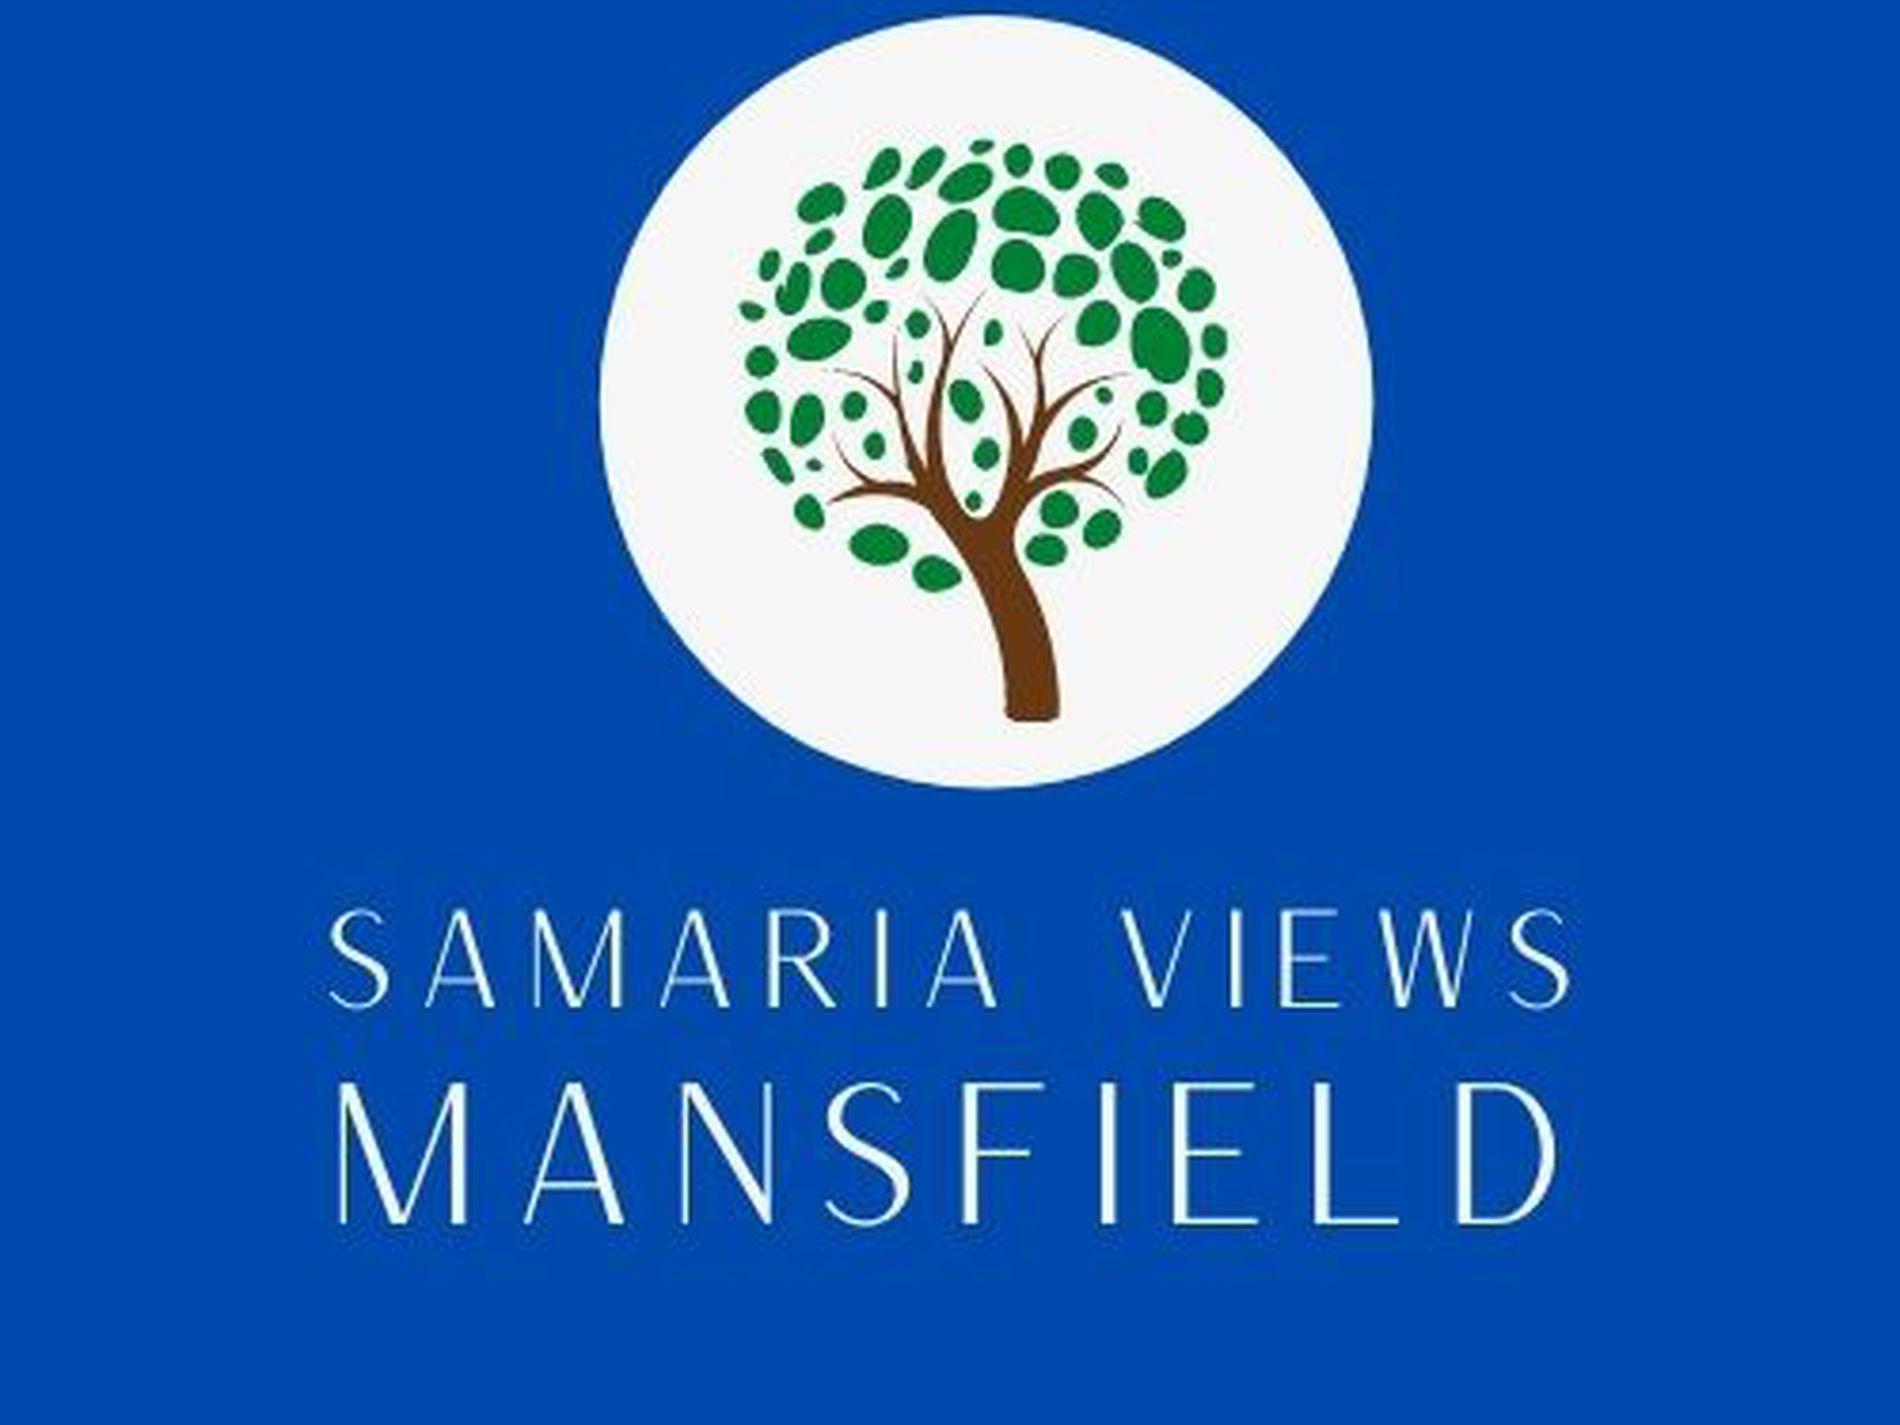 Lot 115, Samaria Views, Mansfield